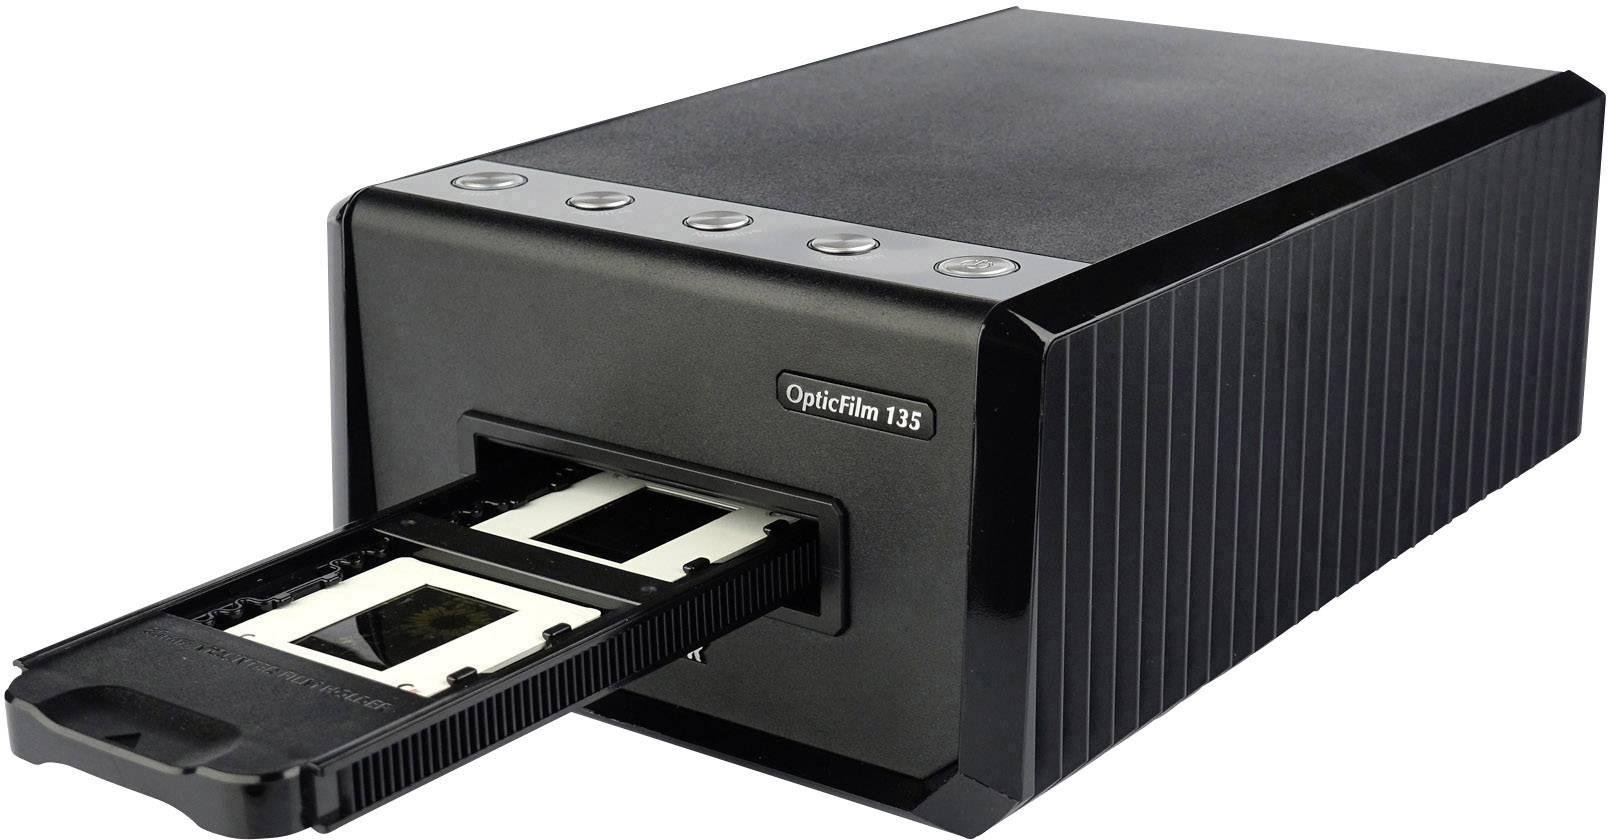 Plustek OpticFilm 135 Slide scanner, Negative scanner 3600 x